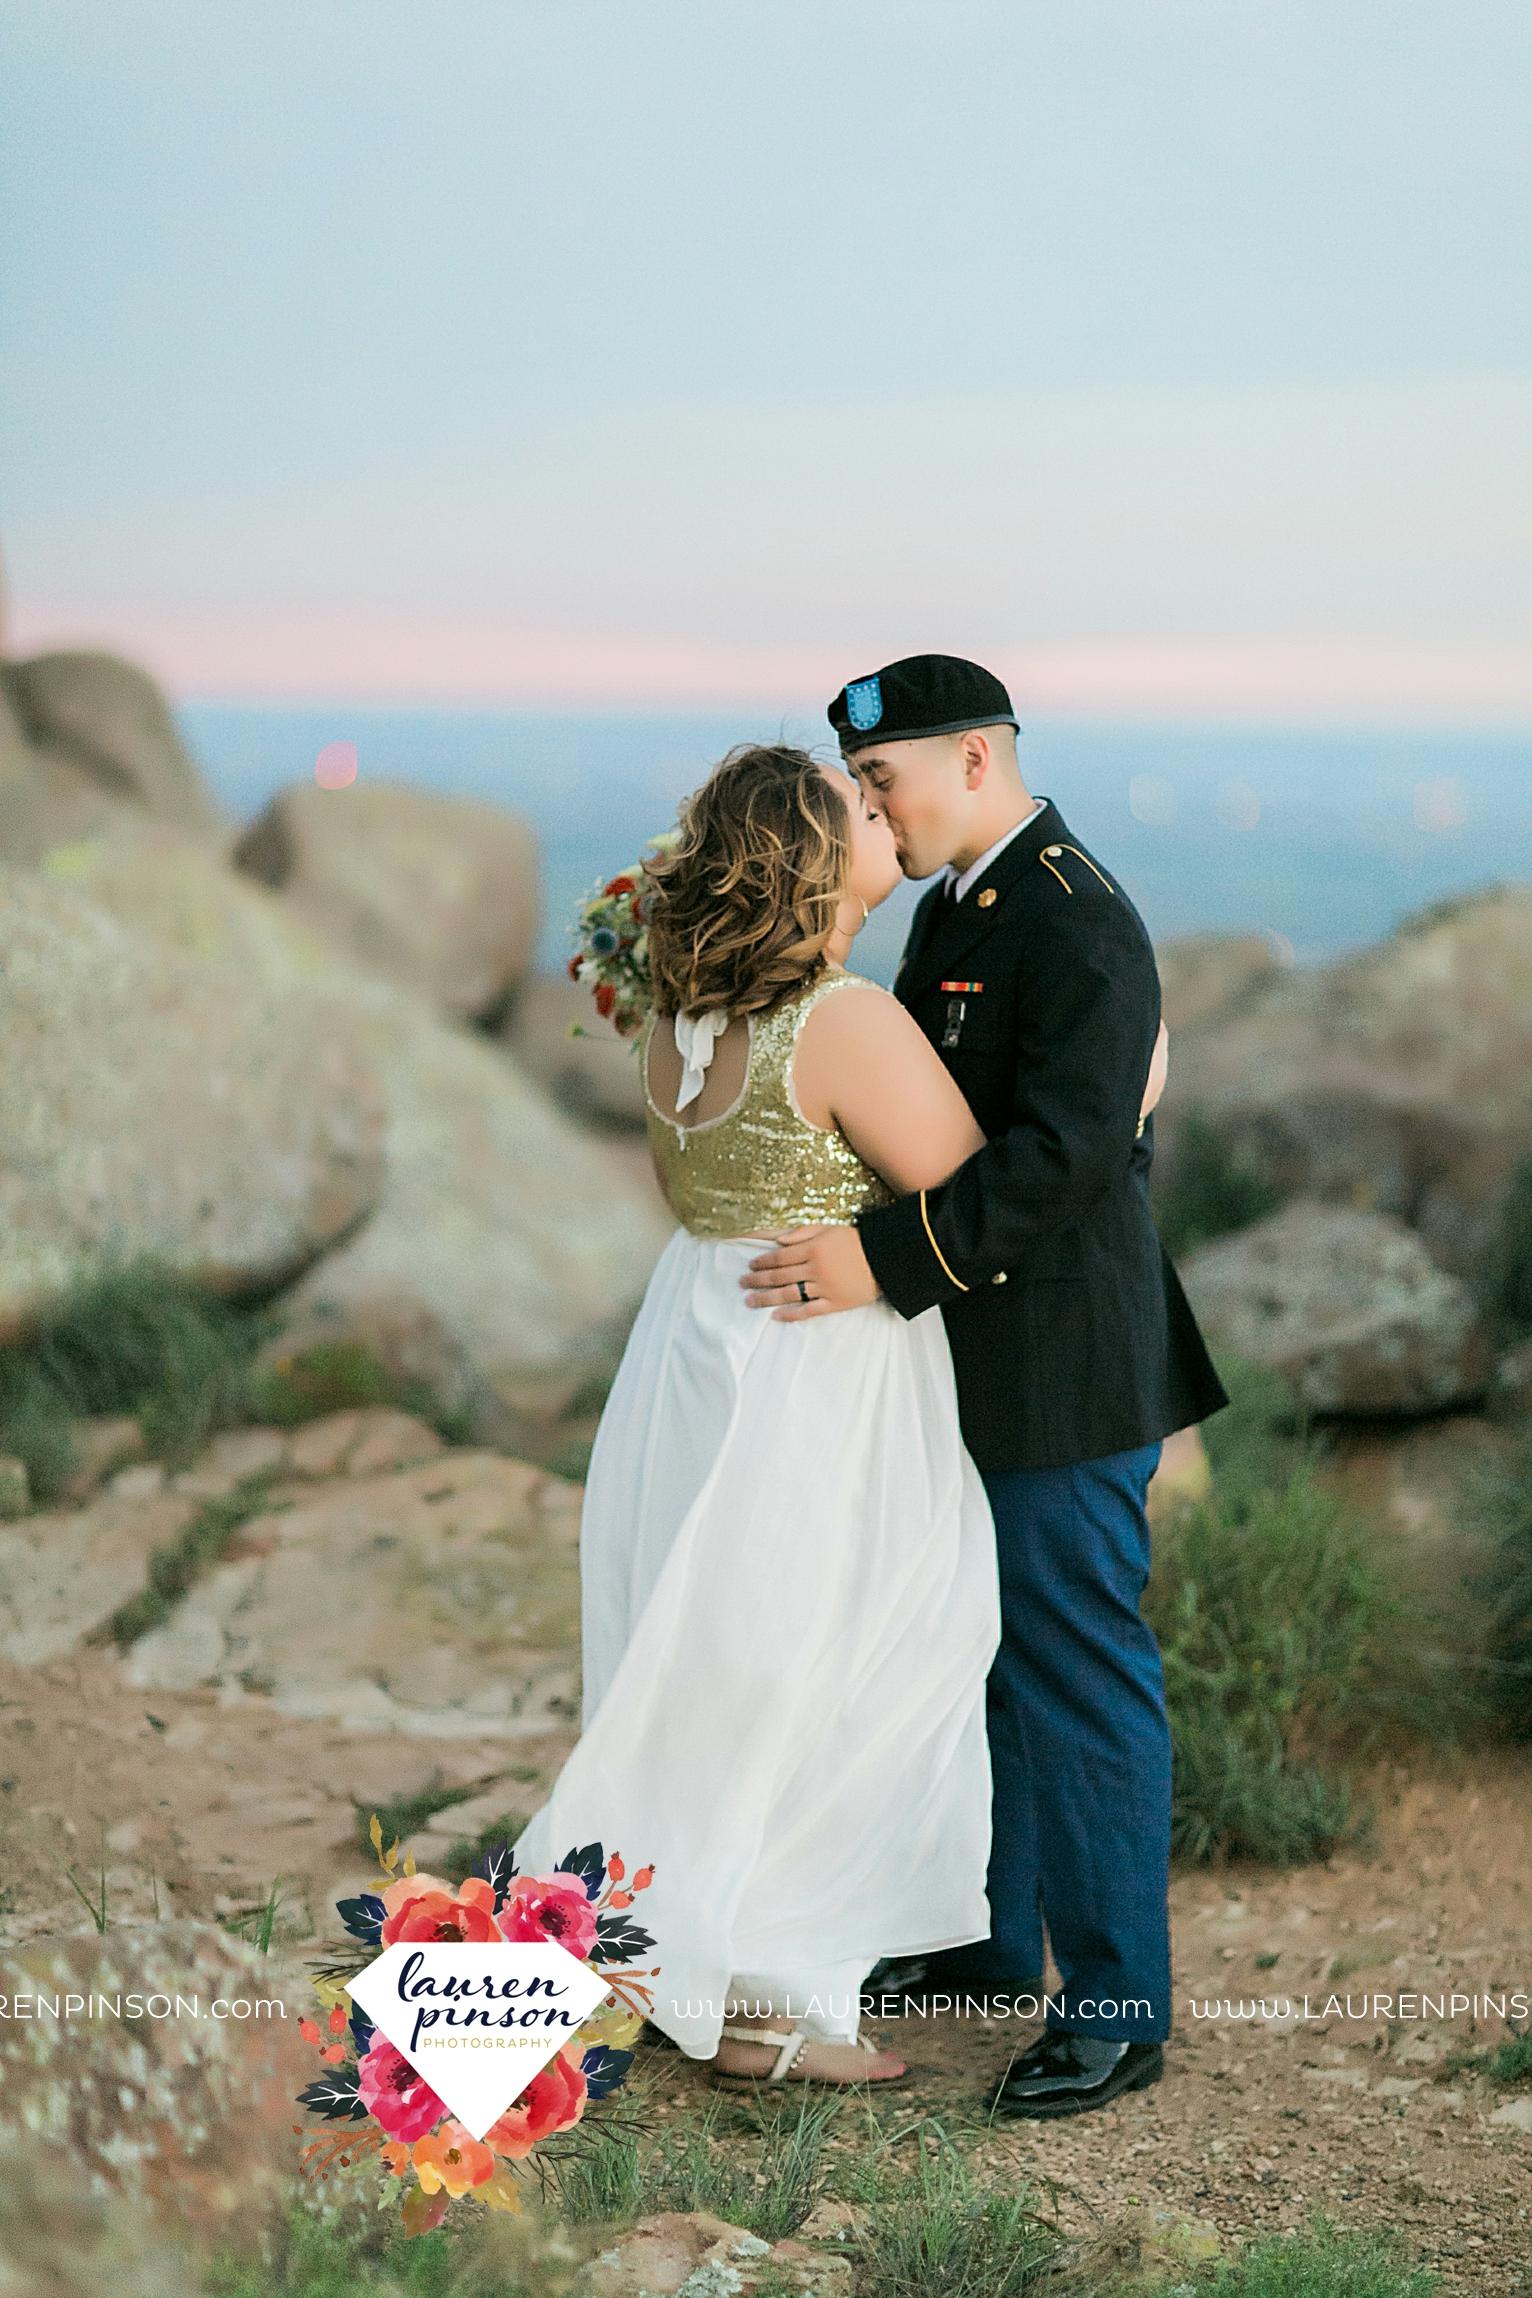 wichita-falls-texas-wedding-photography-engagement-session-army-fort-sill-lawton-oklahoma-wichita-mountains-newlyweds-00013.jpg